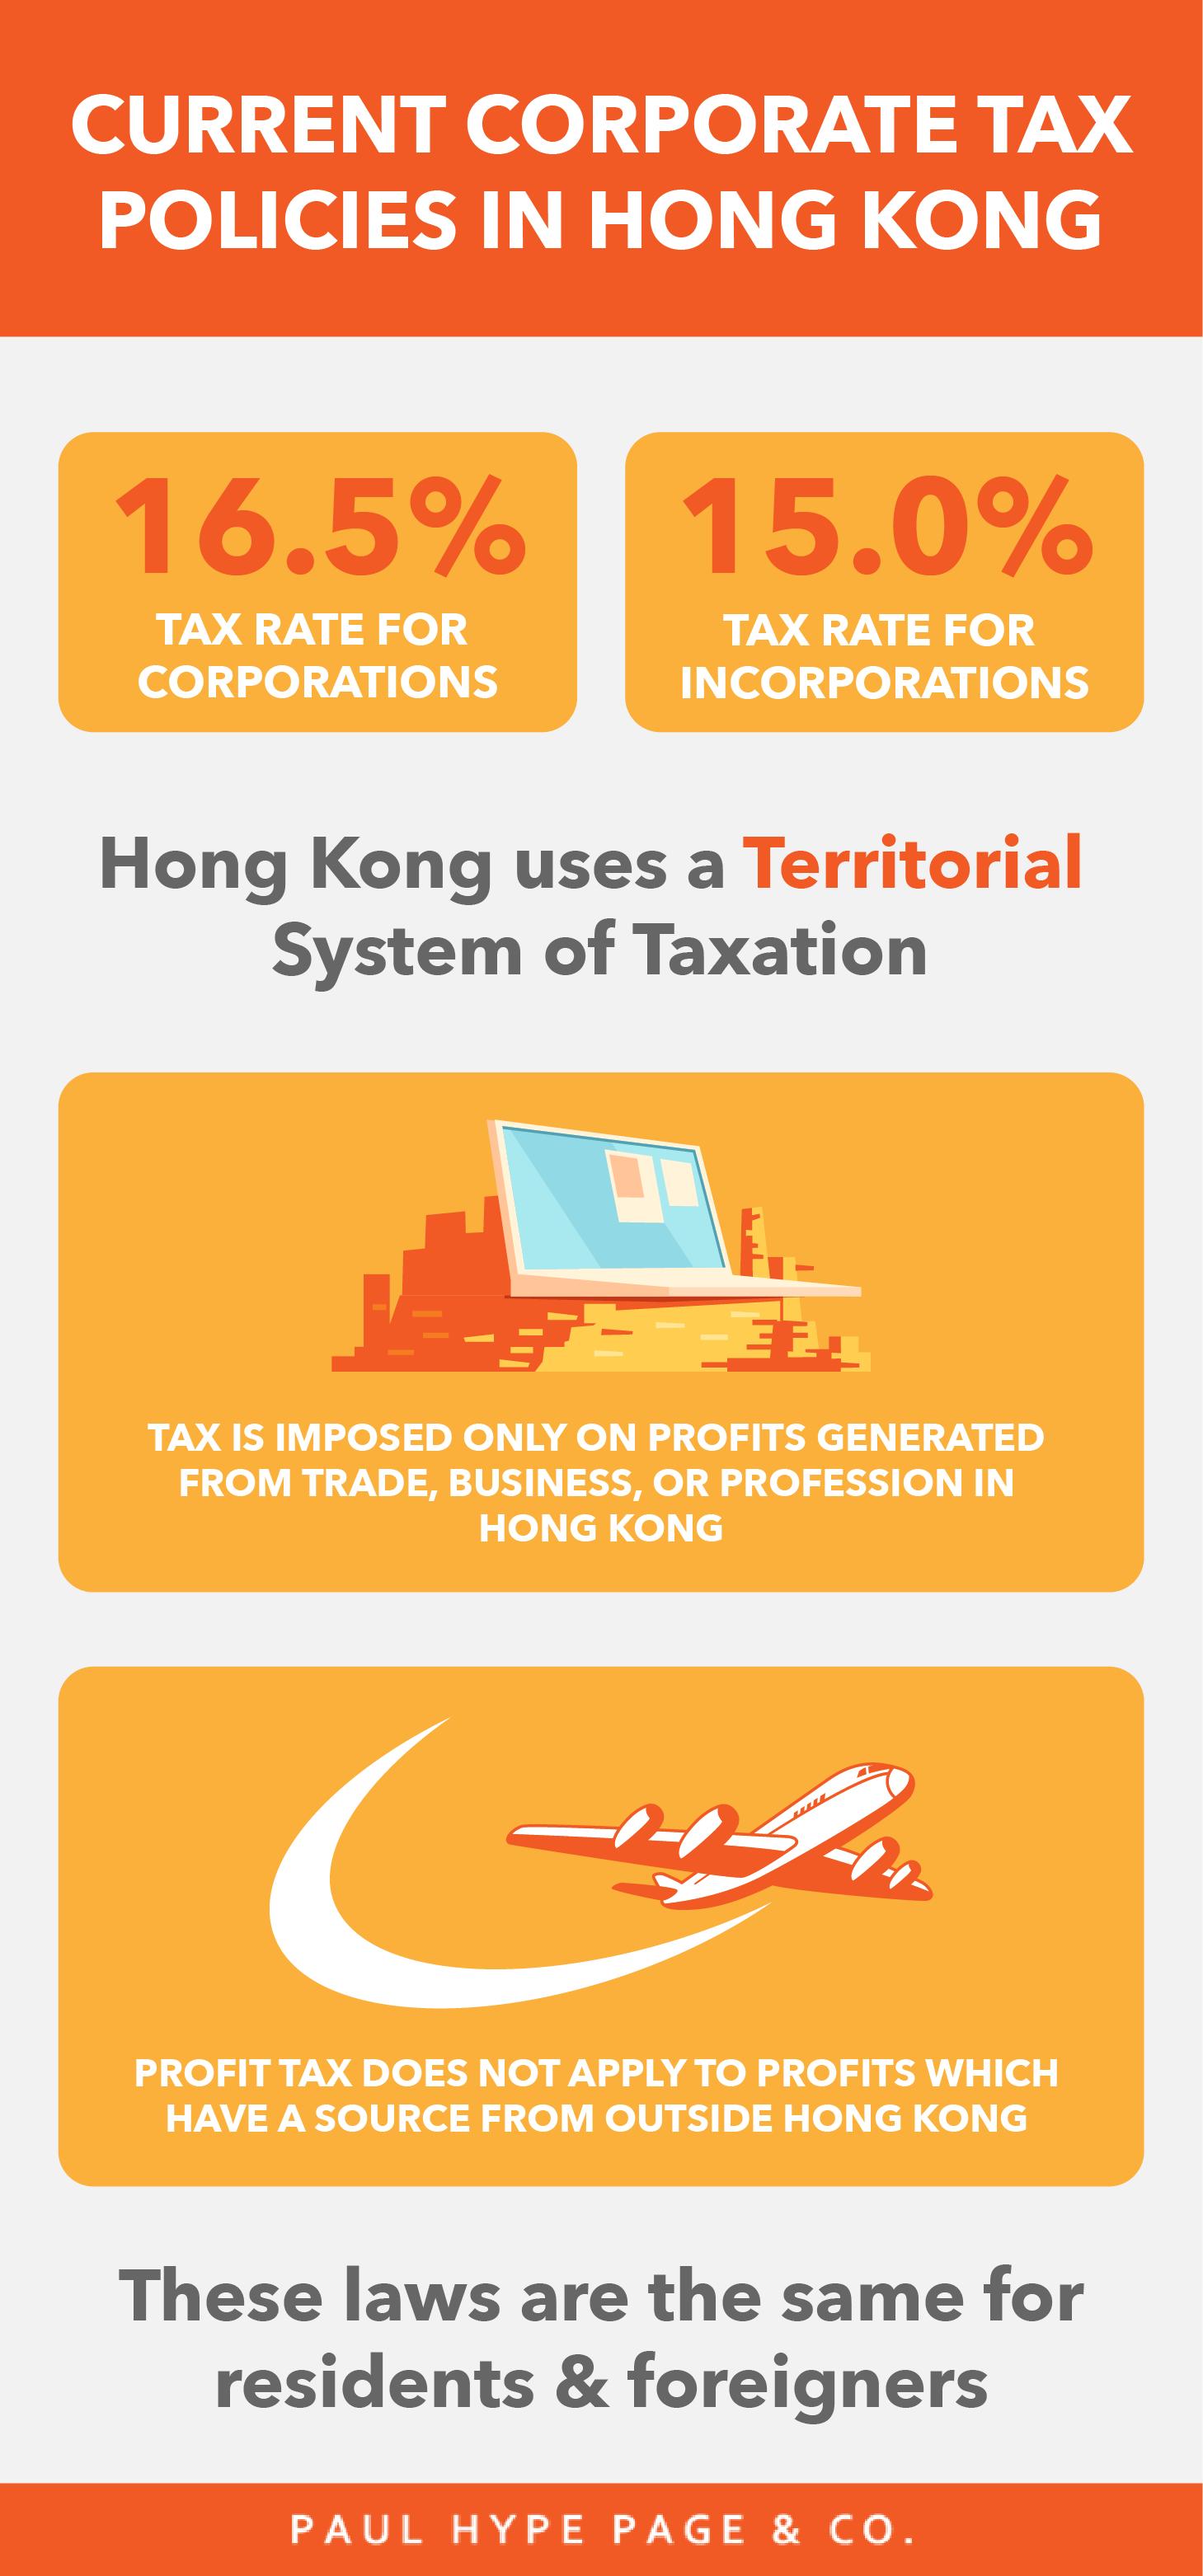 Corporate Tax Policies in Hong Kong